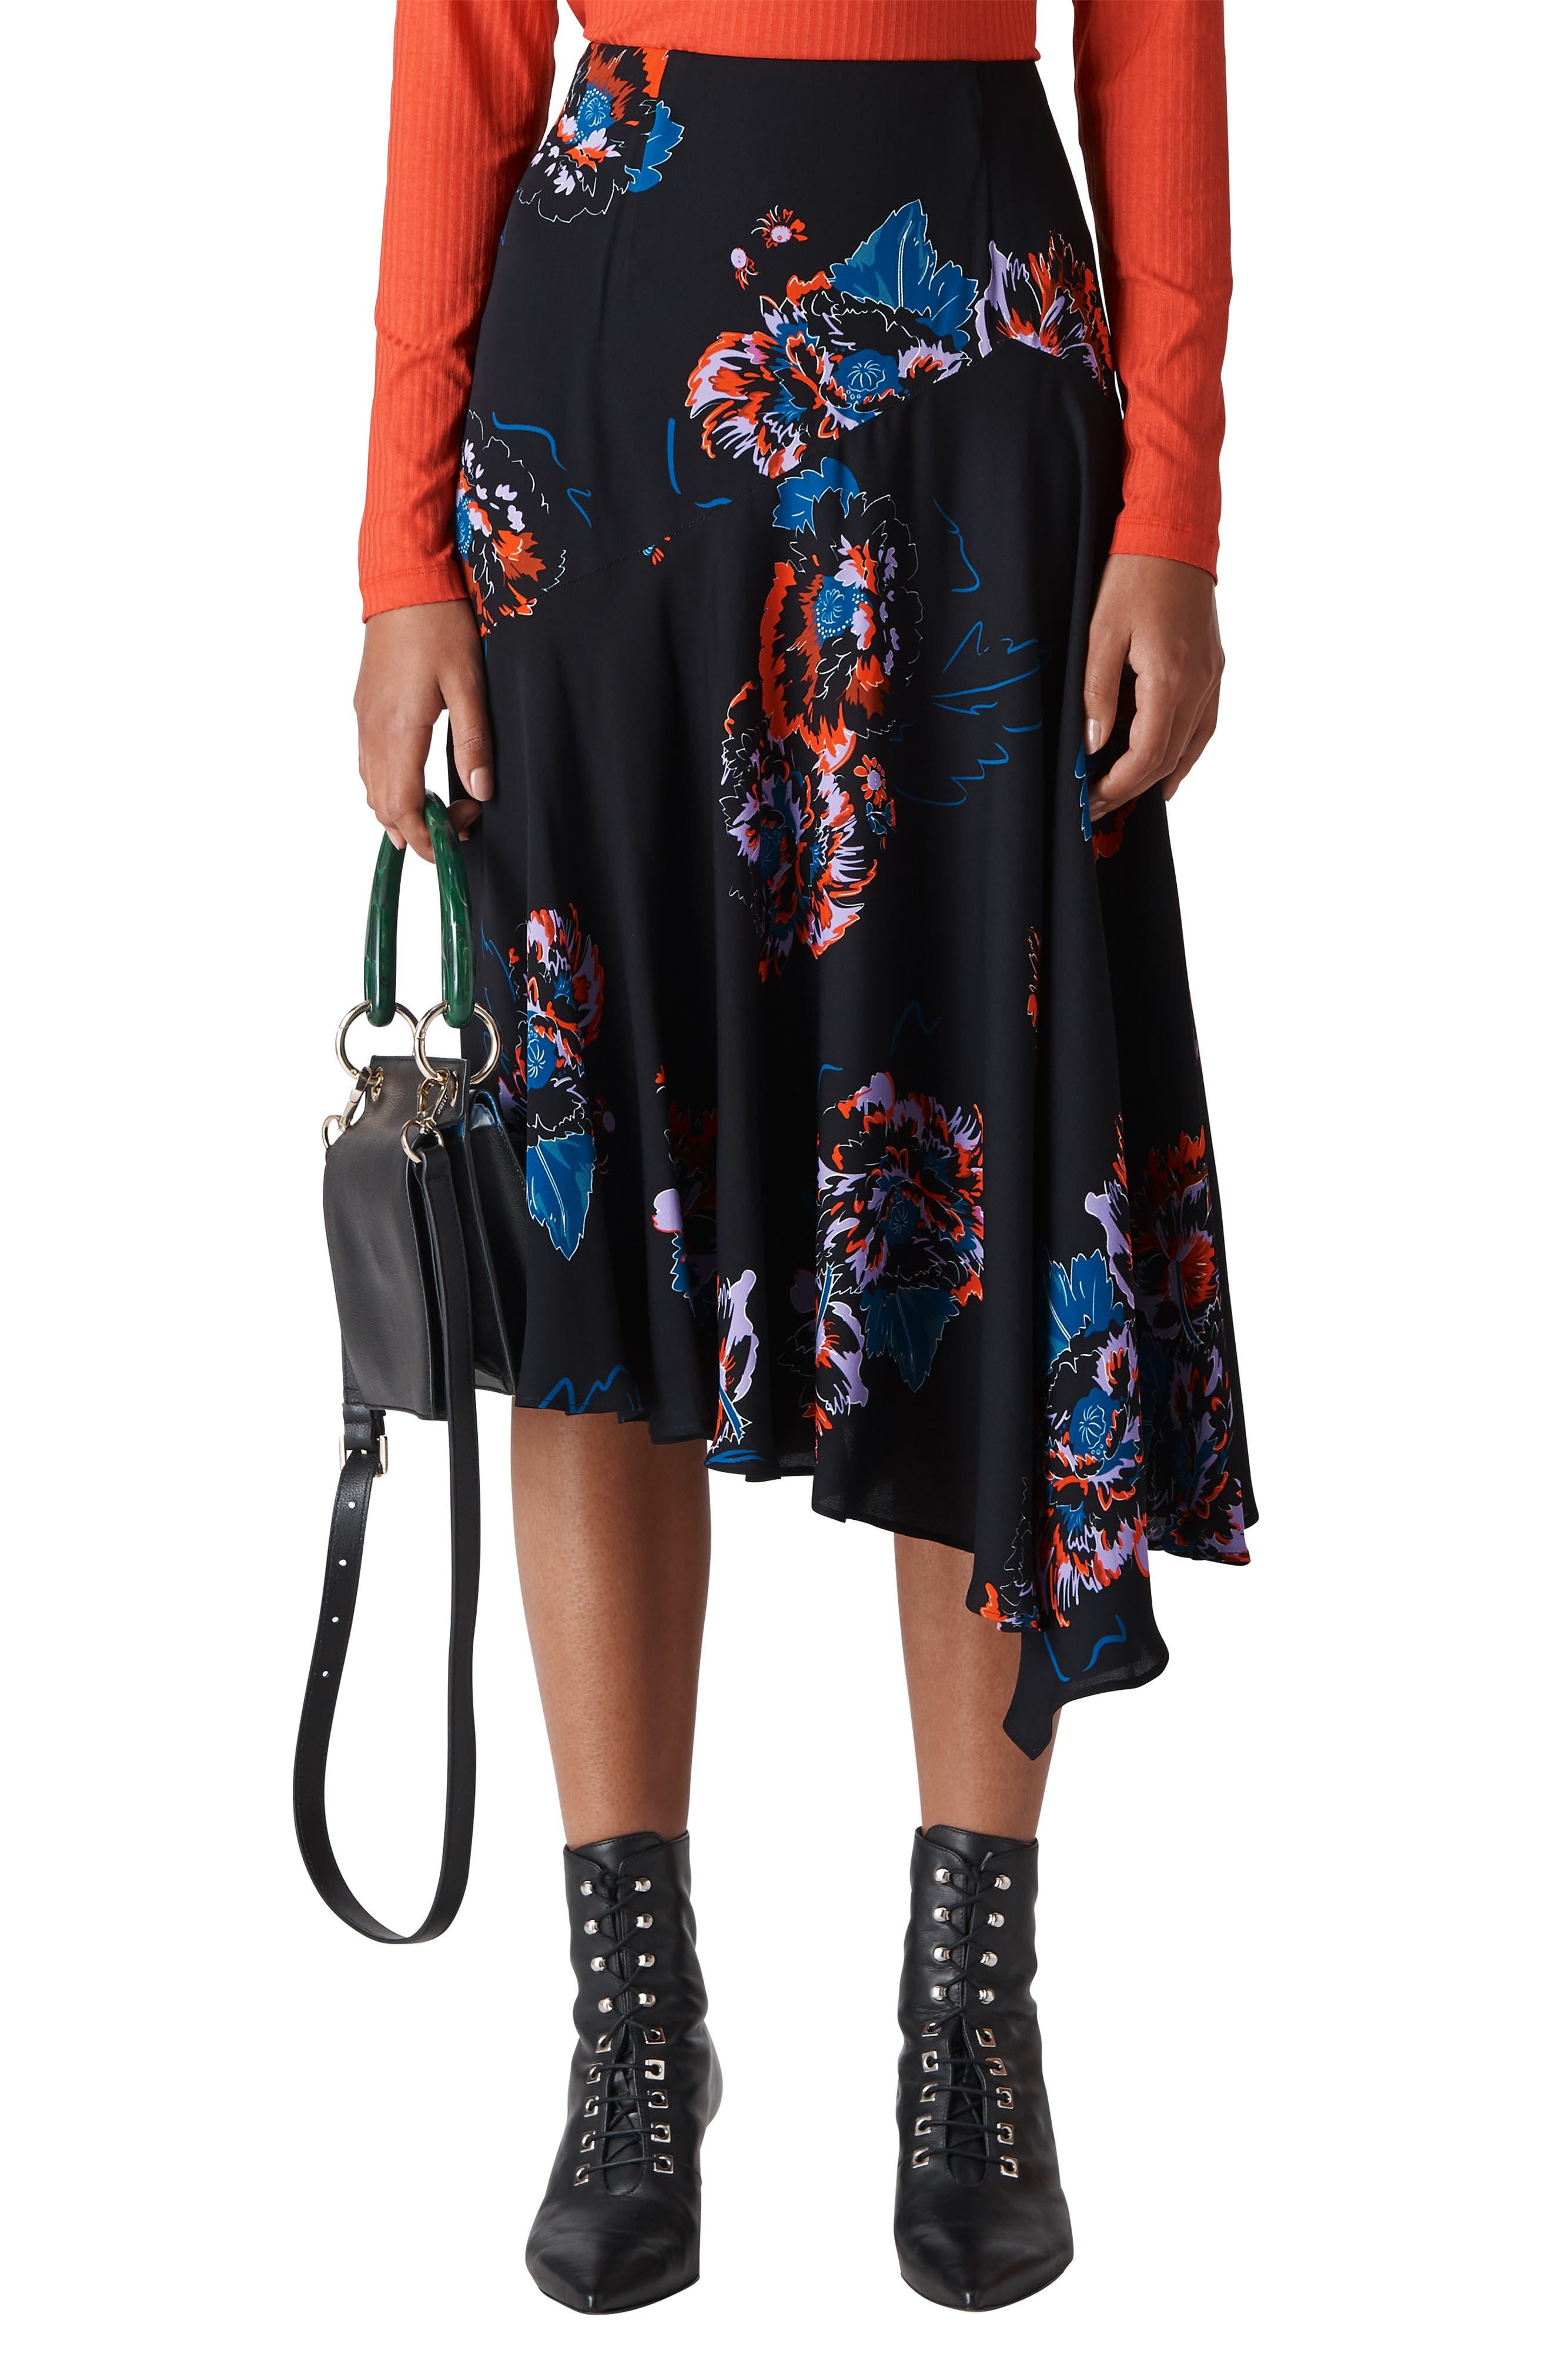 Freya Floral Asymmetrical Skirt,                             Main thumbnail 1, color,                             001